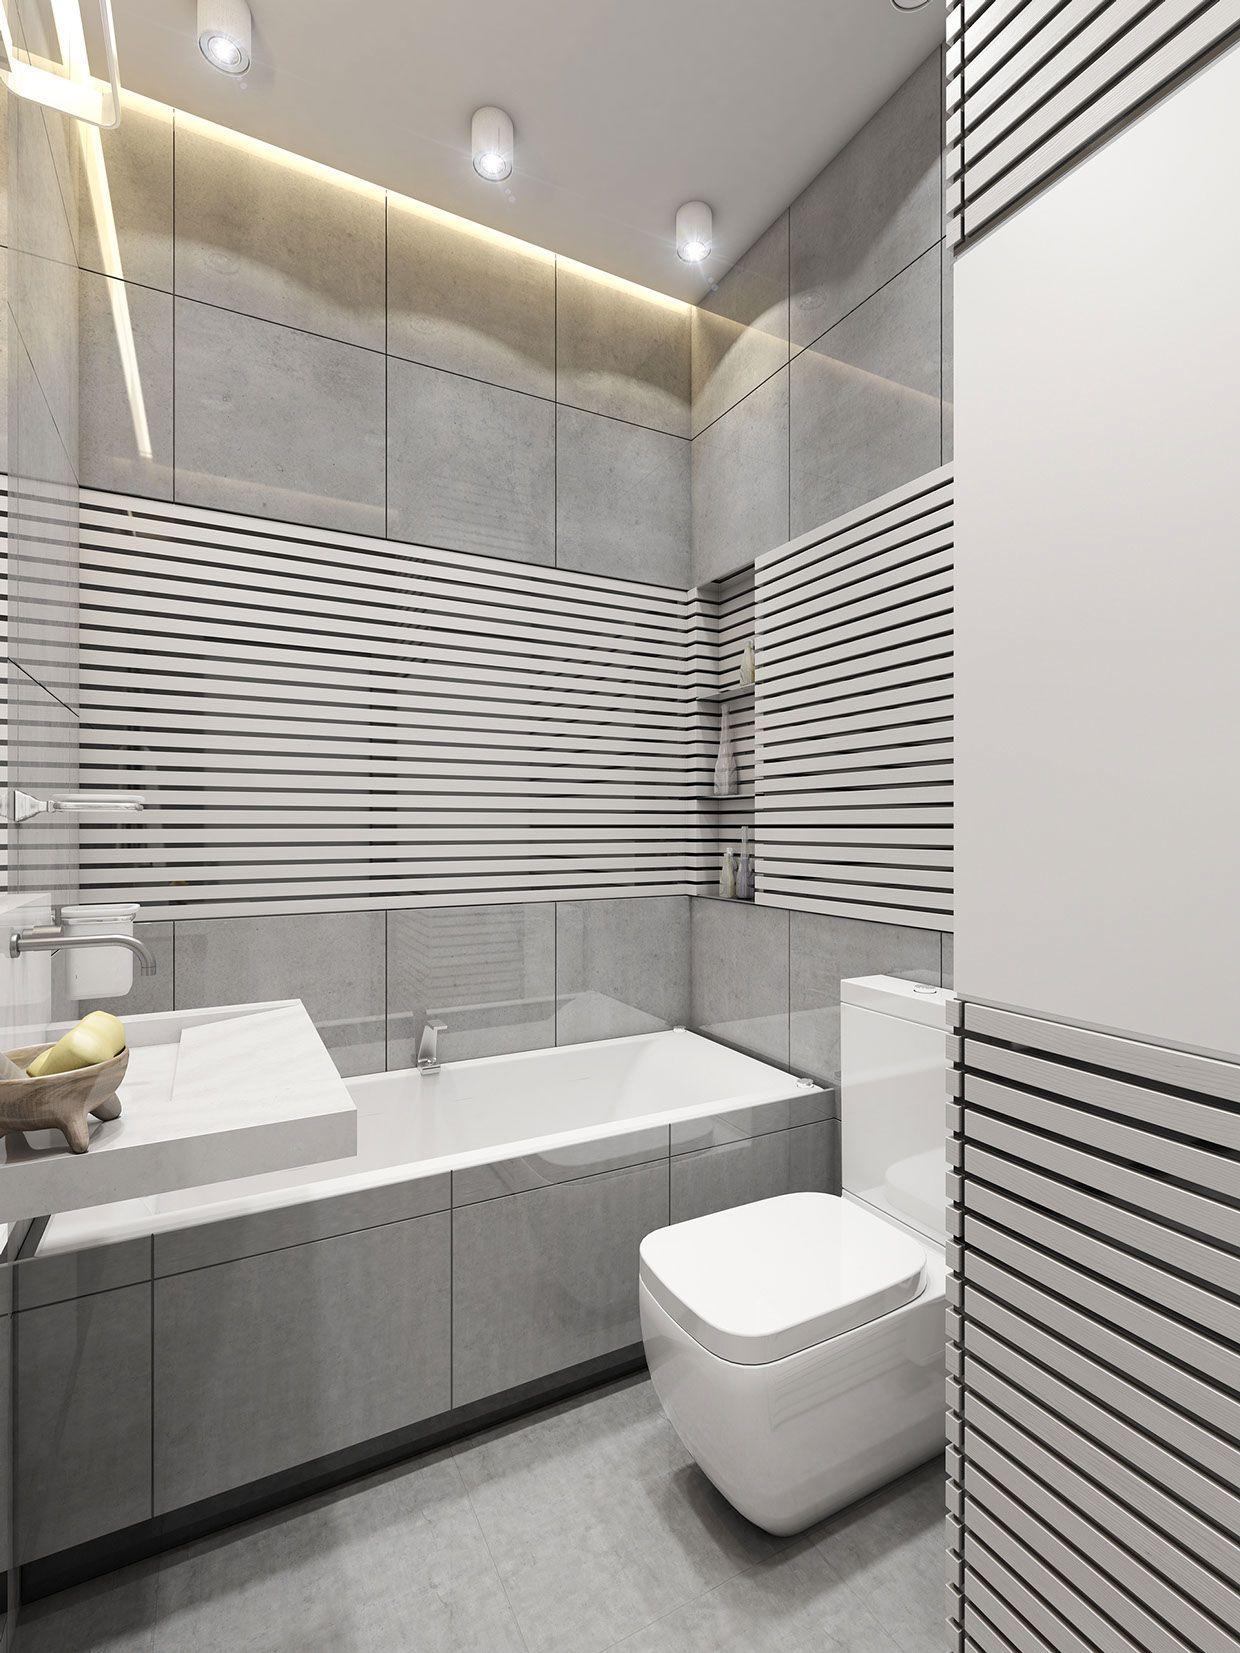 16-small-modern-bathroom.jpg (1240×1653)